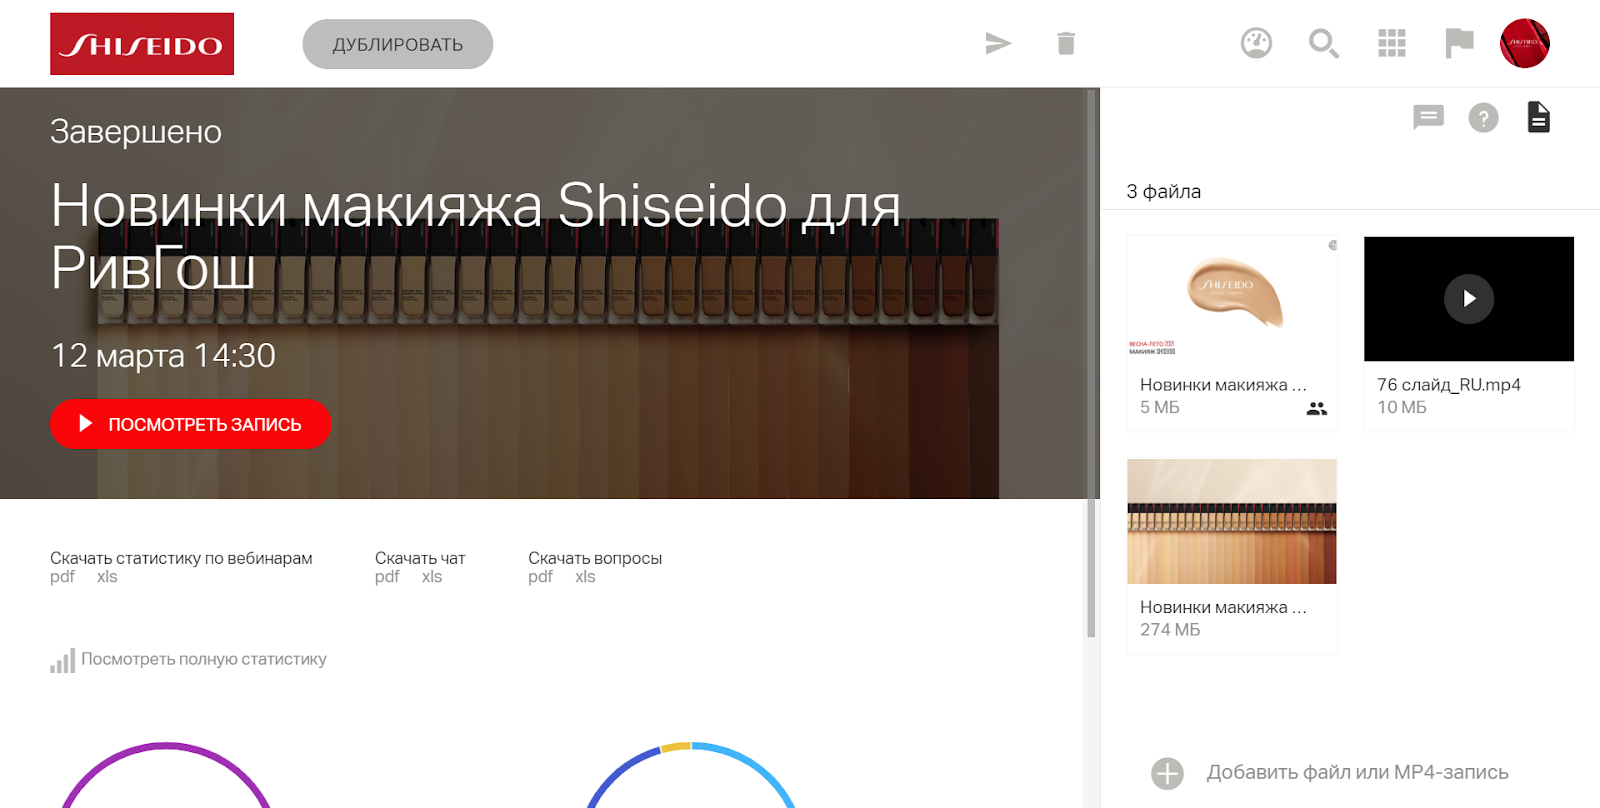 mediacontent_sheseido